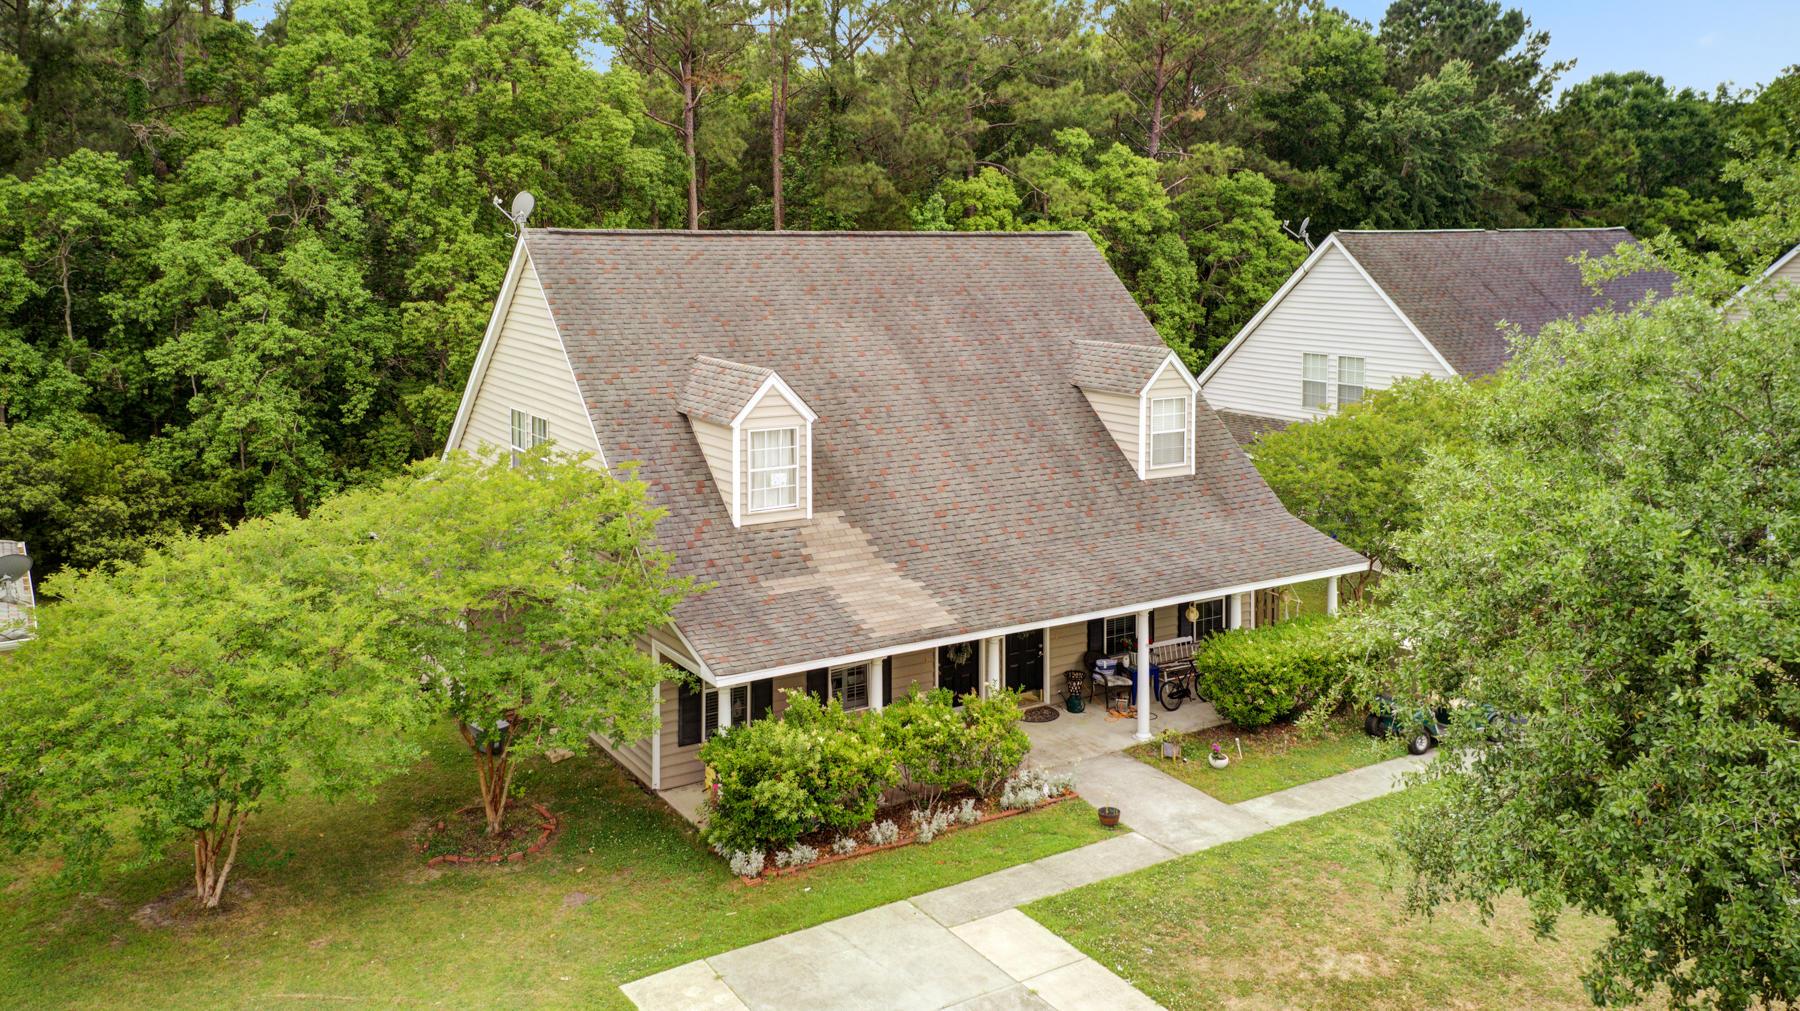 Dunes West Homes For Sale - 2232 Kings Gate, Mount Pleasant, SC - 24